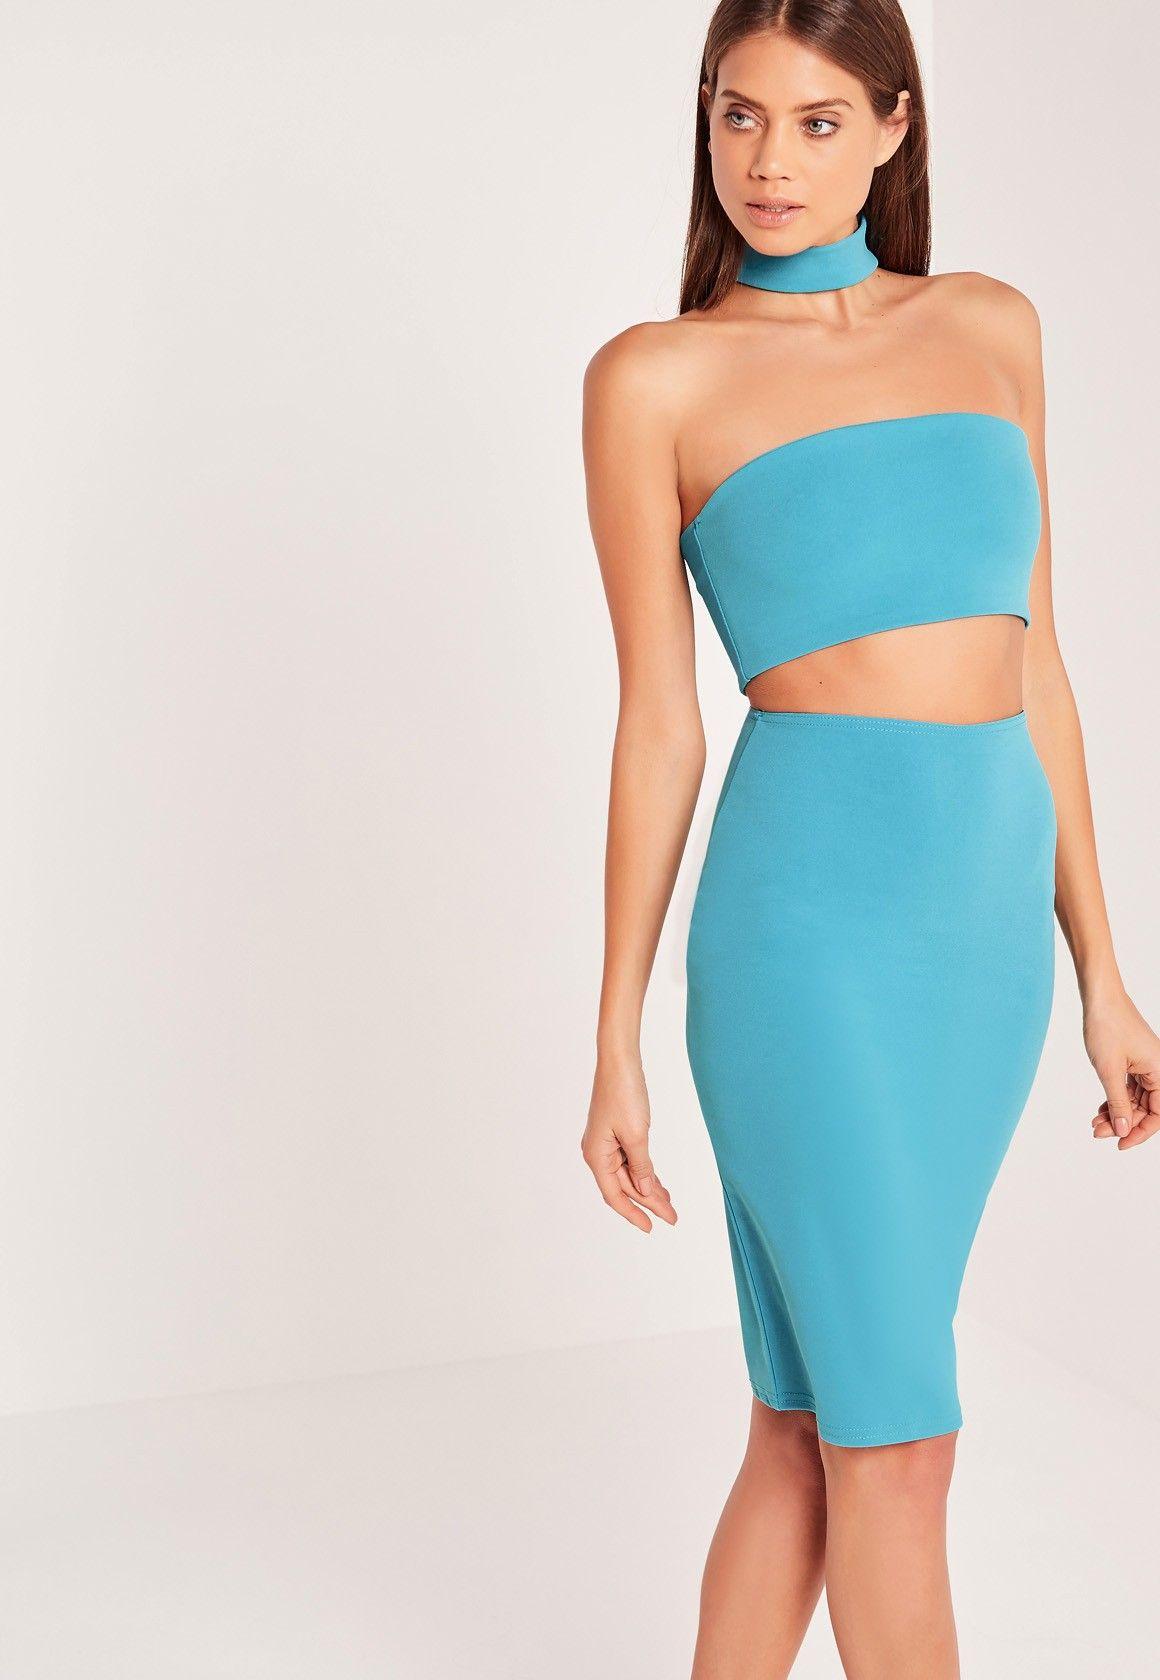 Missguided - Choker Midi Dress Blue | Honeymoon Looks | Pinterest ...